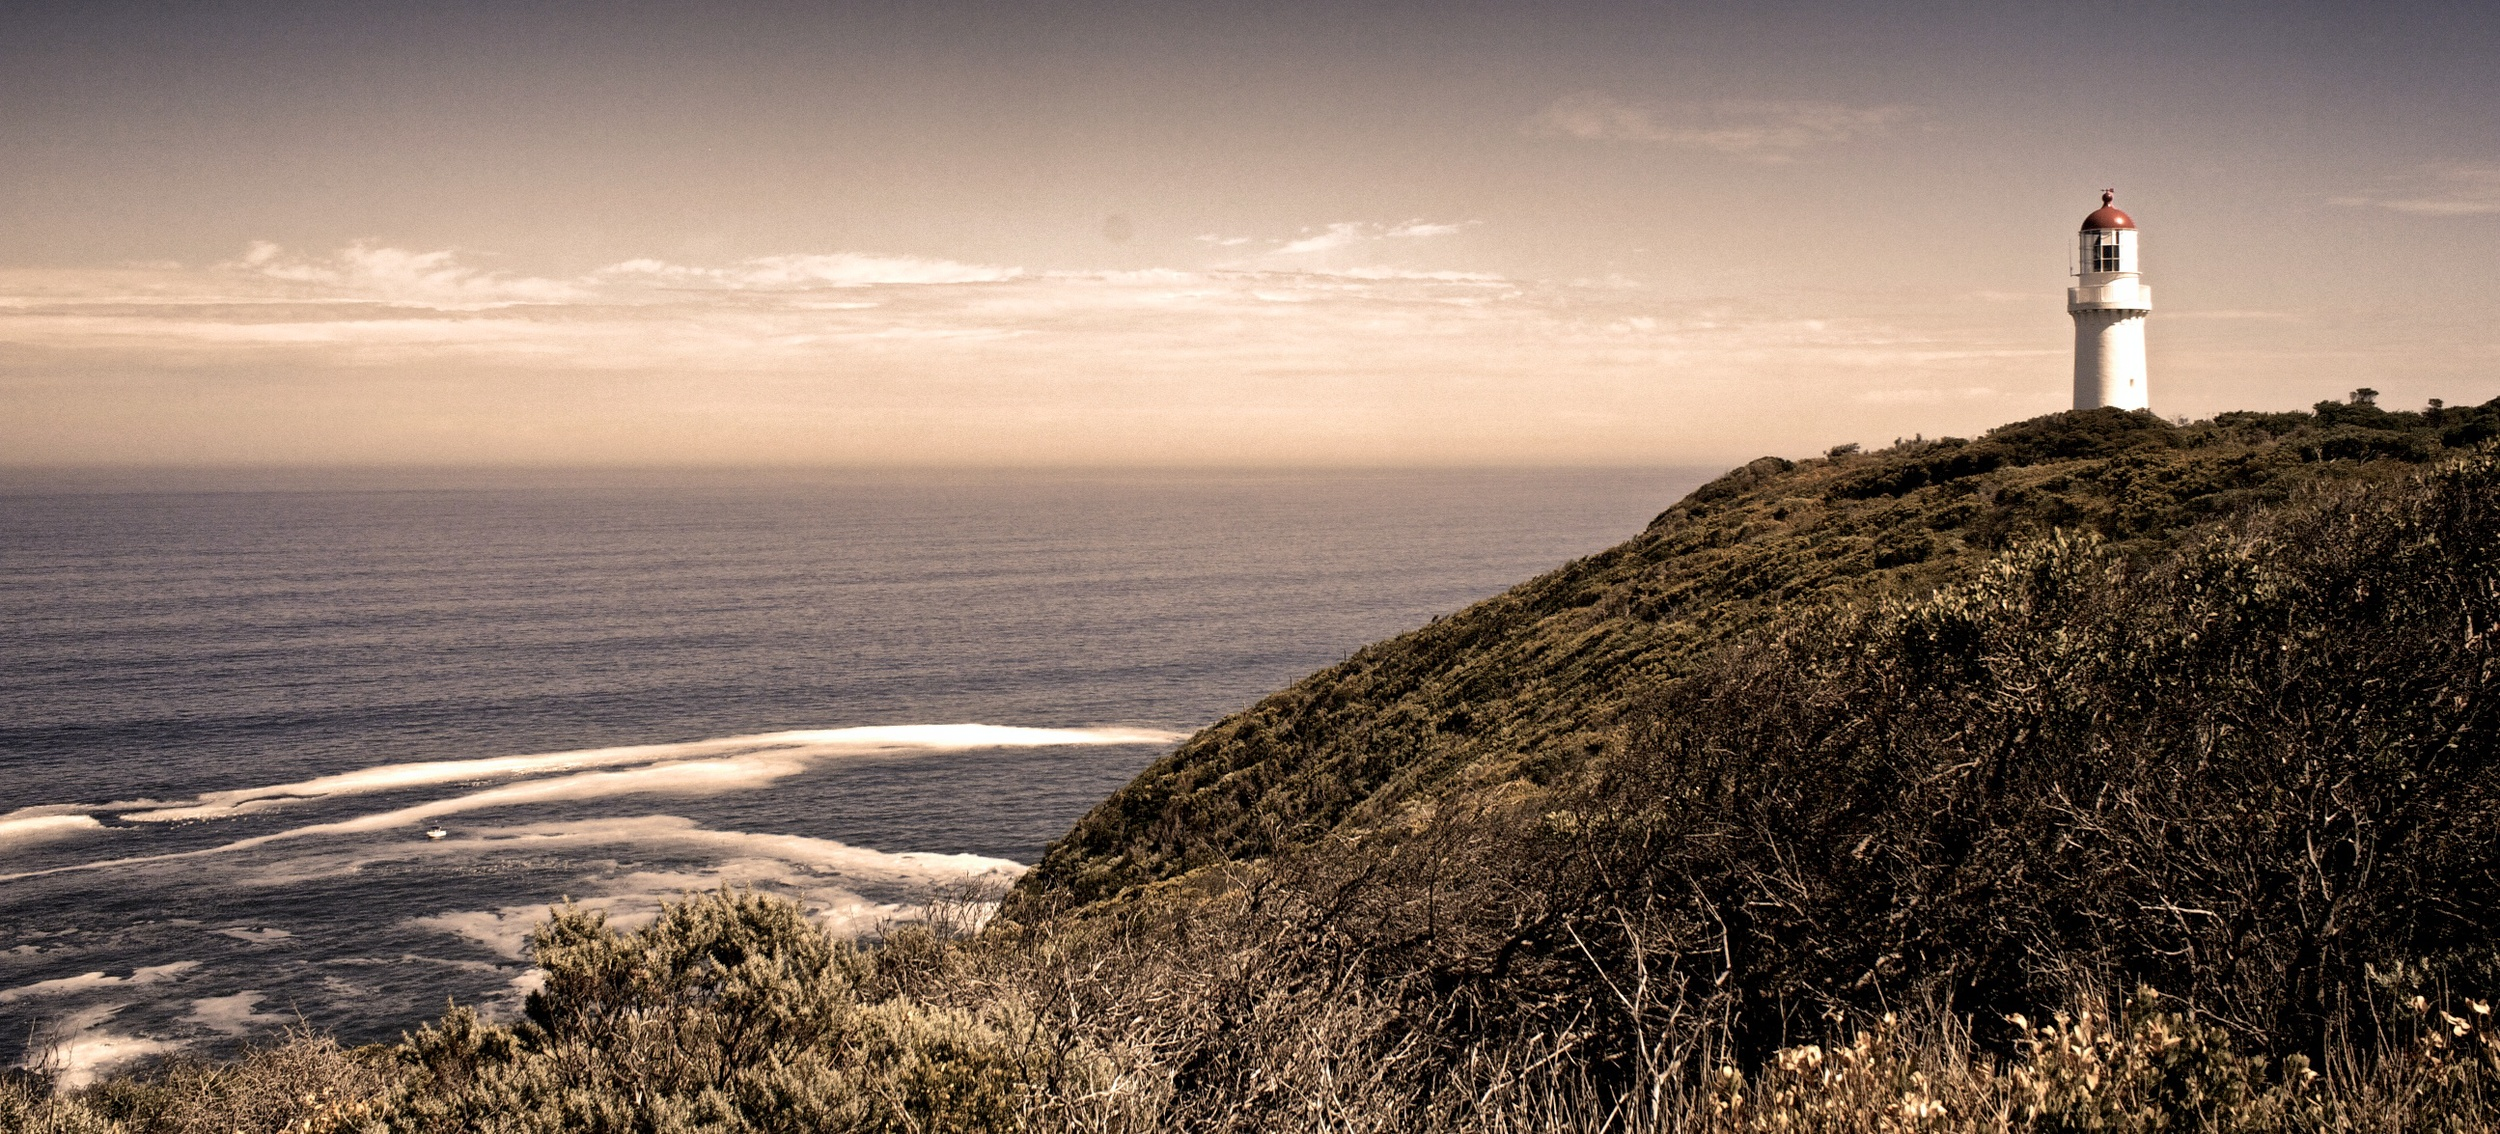 Cape Schanck Lighthouse, Mornington Peninsula